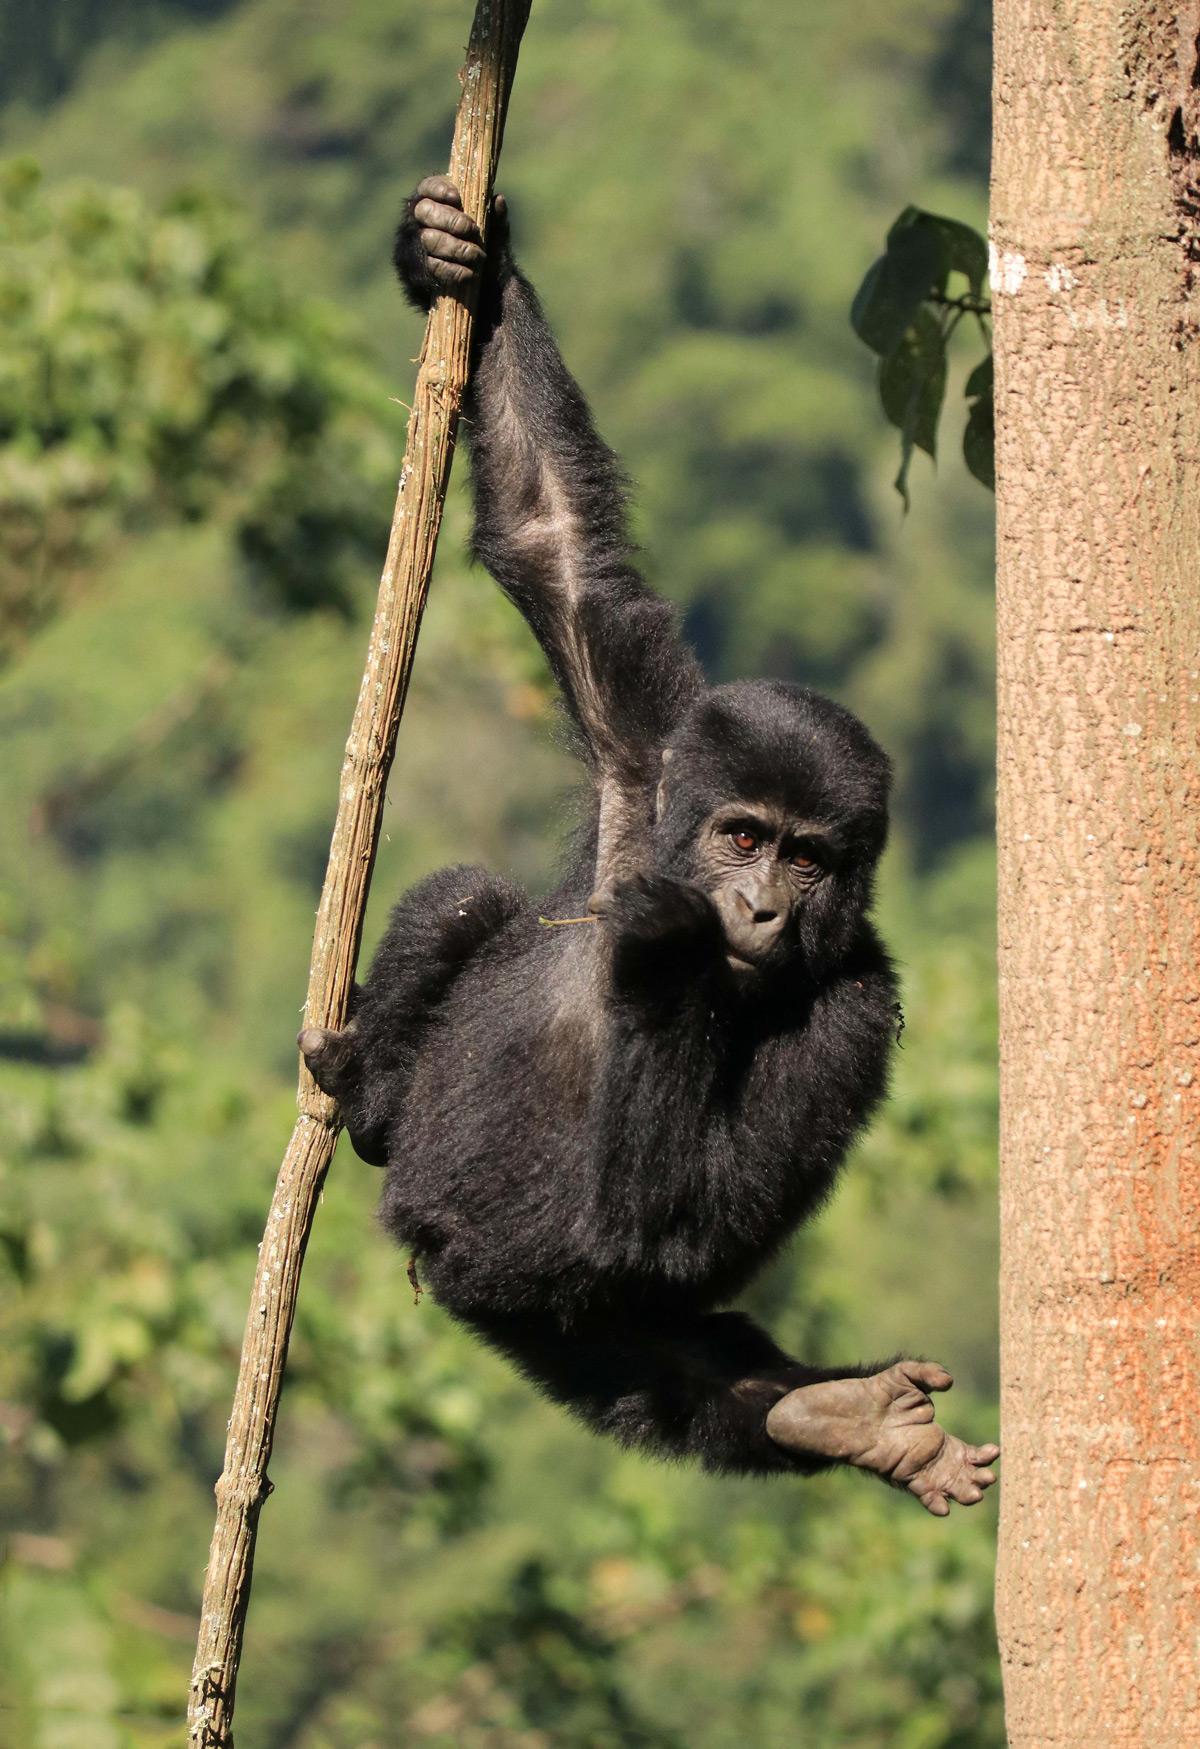 """Hanging out"" – a young mountain gorilla displays its climbing skills in Bwindi Impenetrable National Park, Uganda © Tina Antrobus"